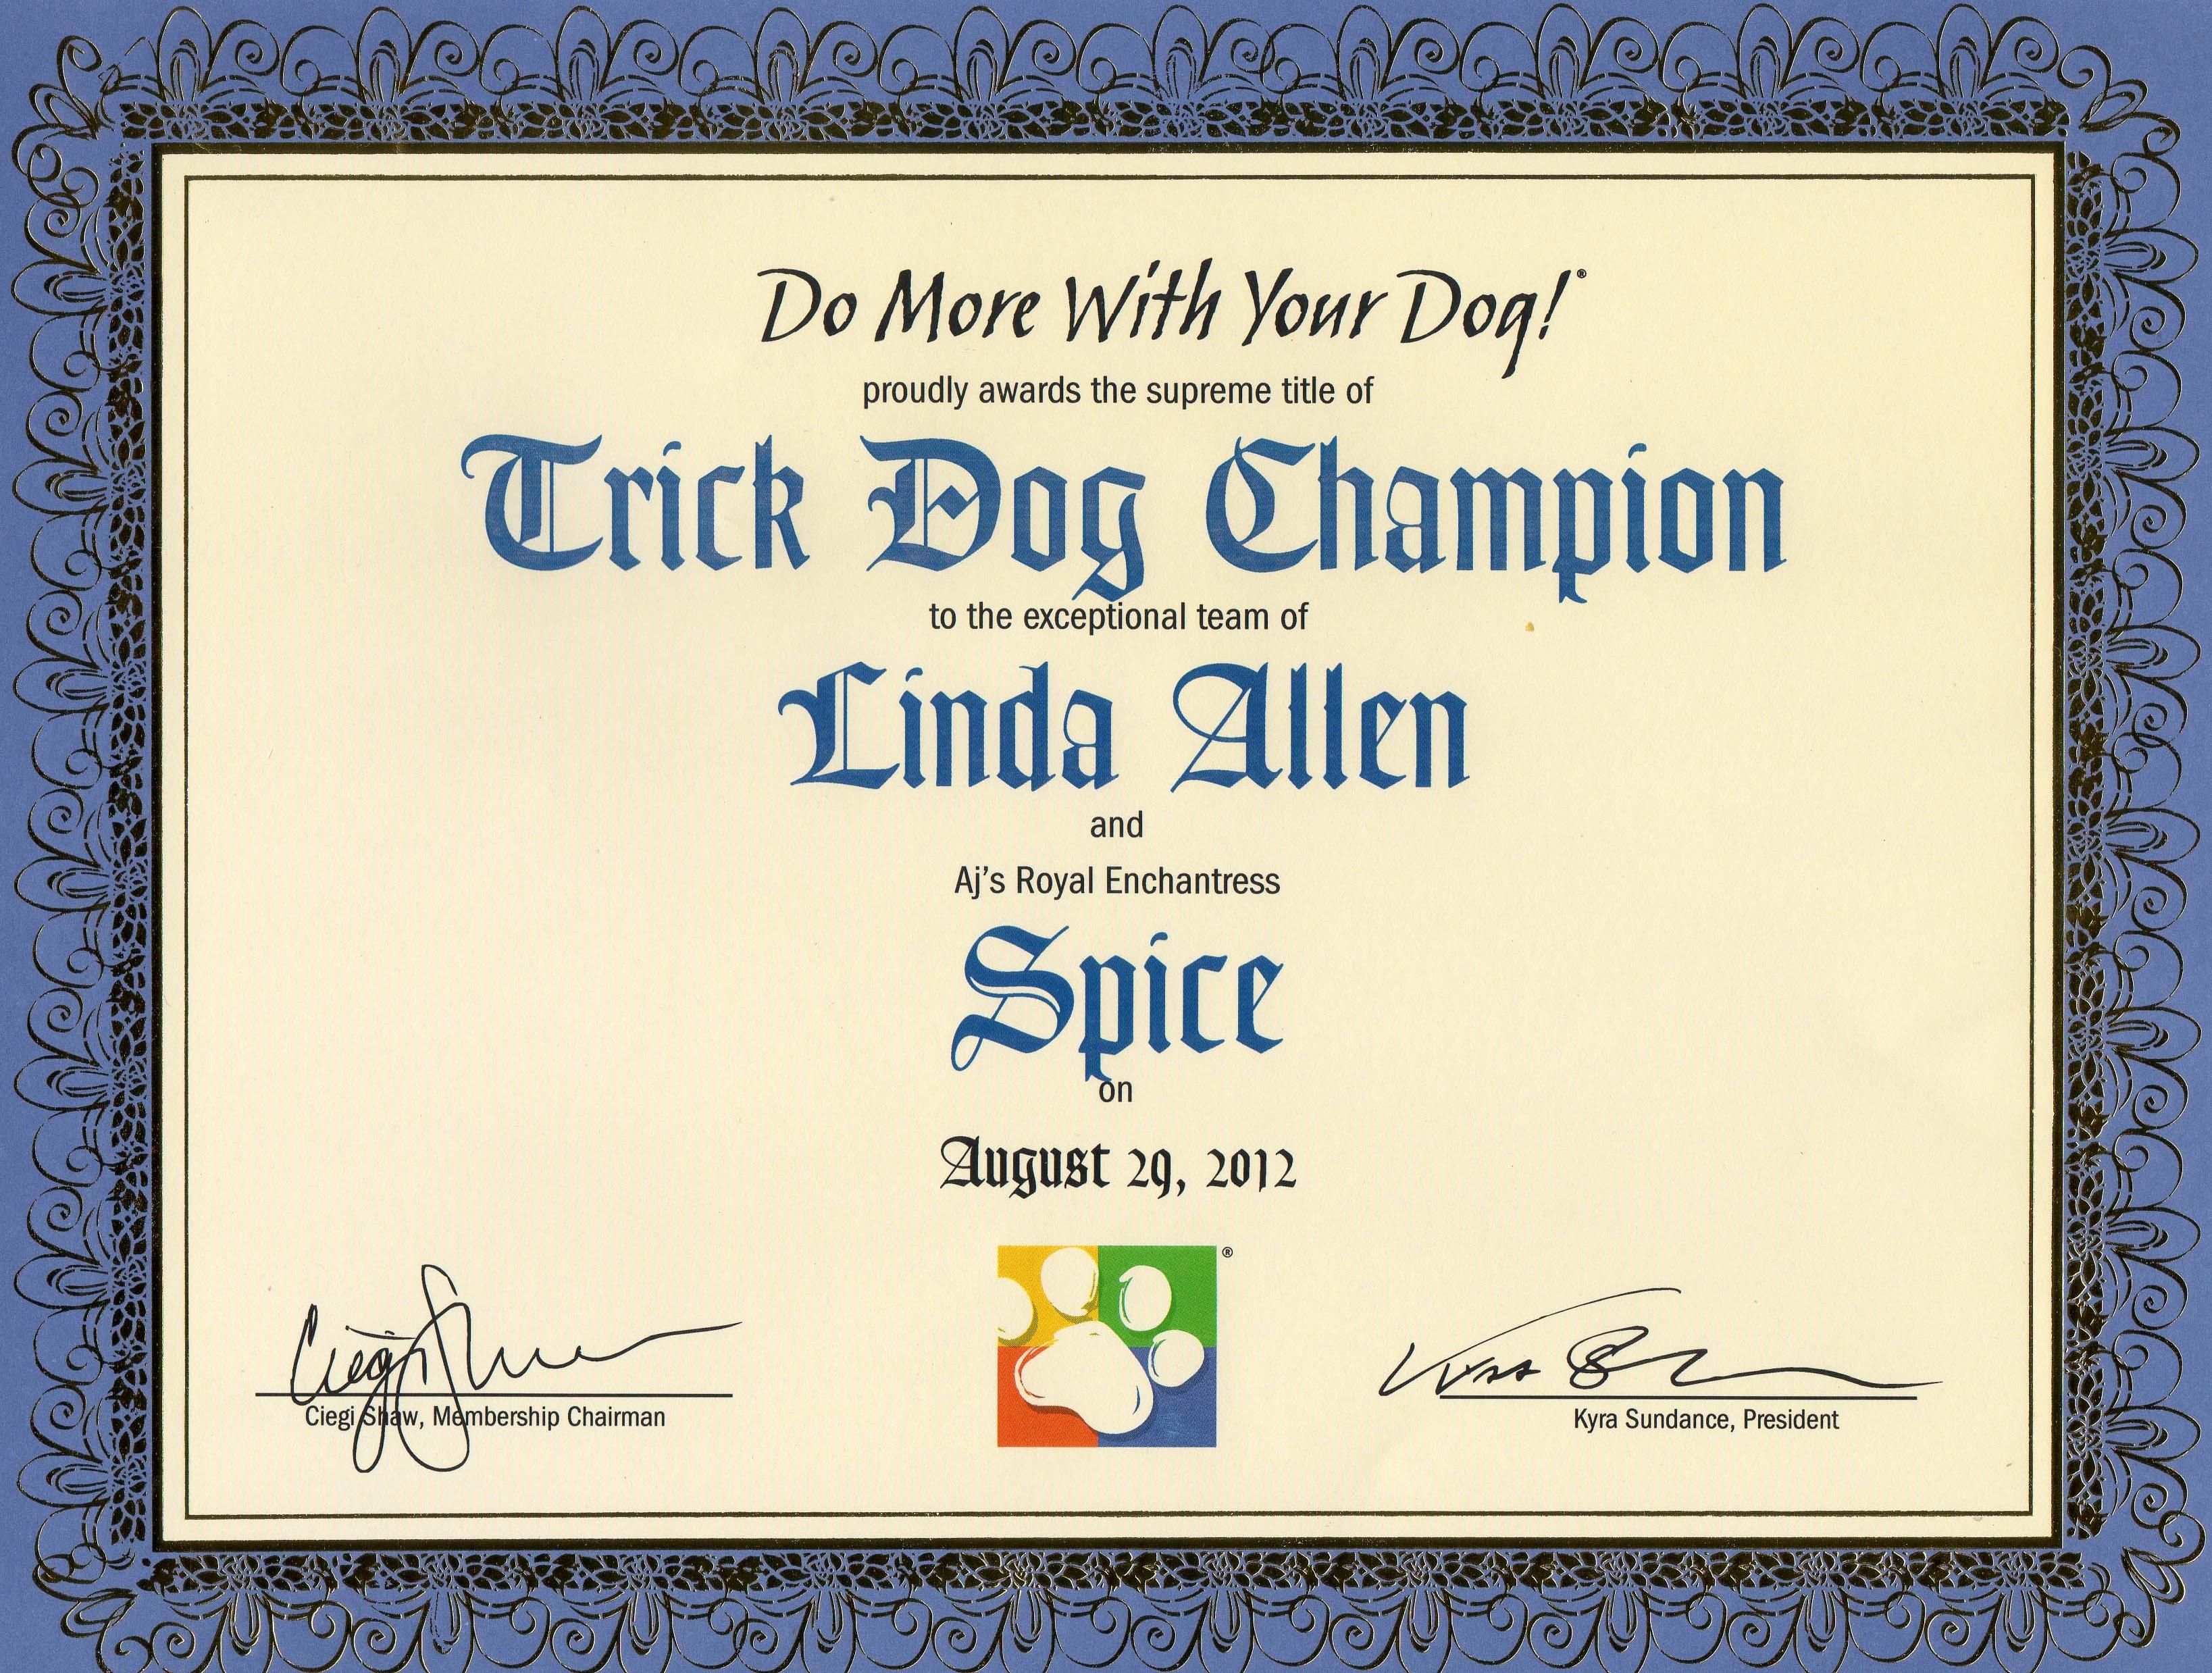 Spice-TDCh